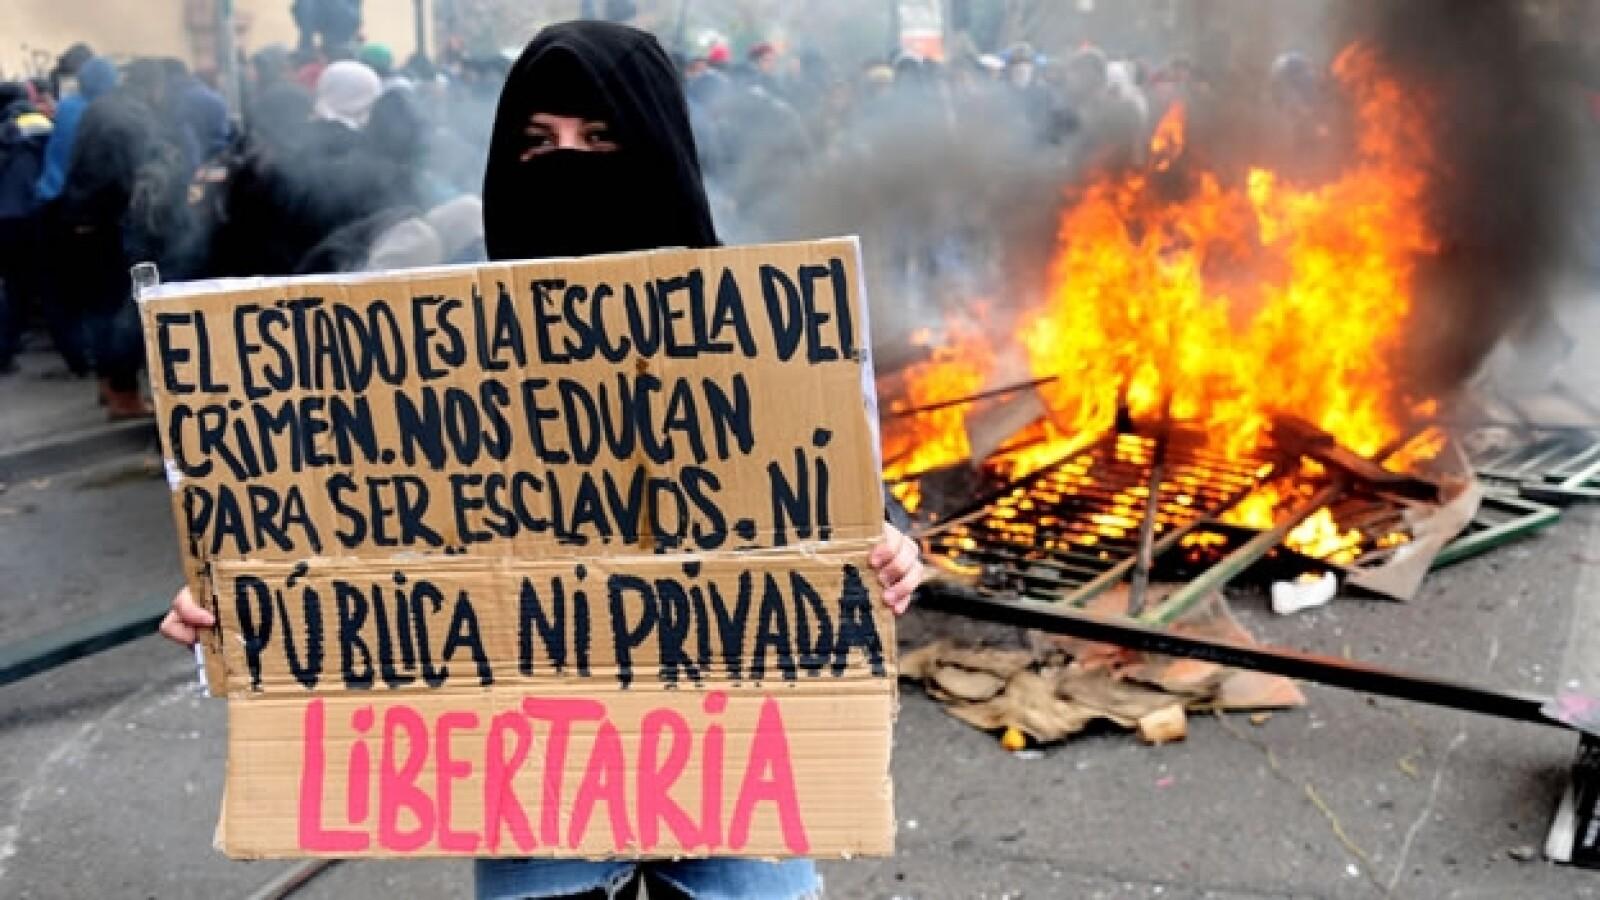 protestas-chile-detenidos-03